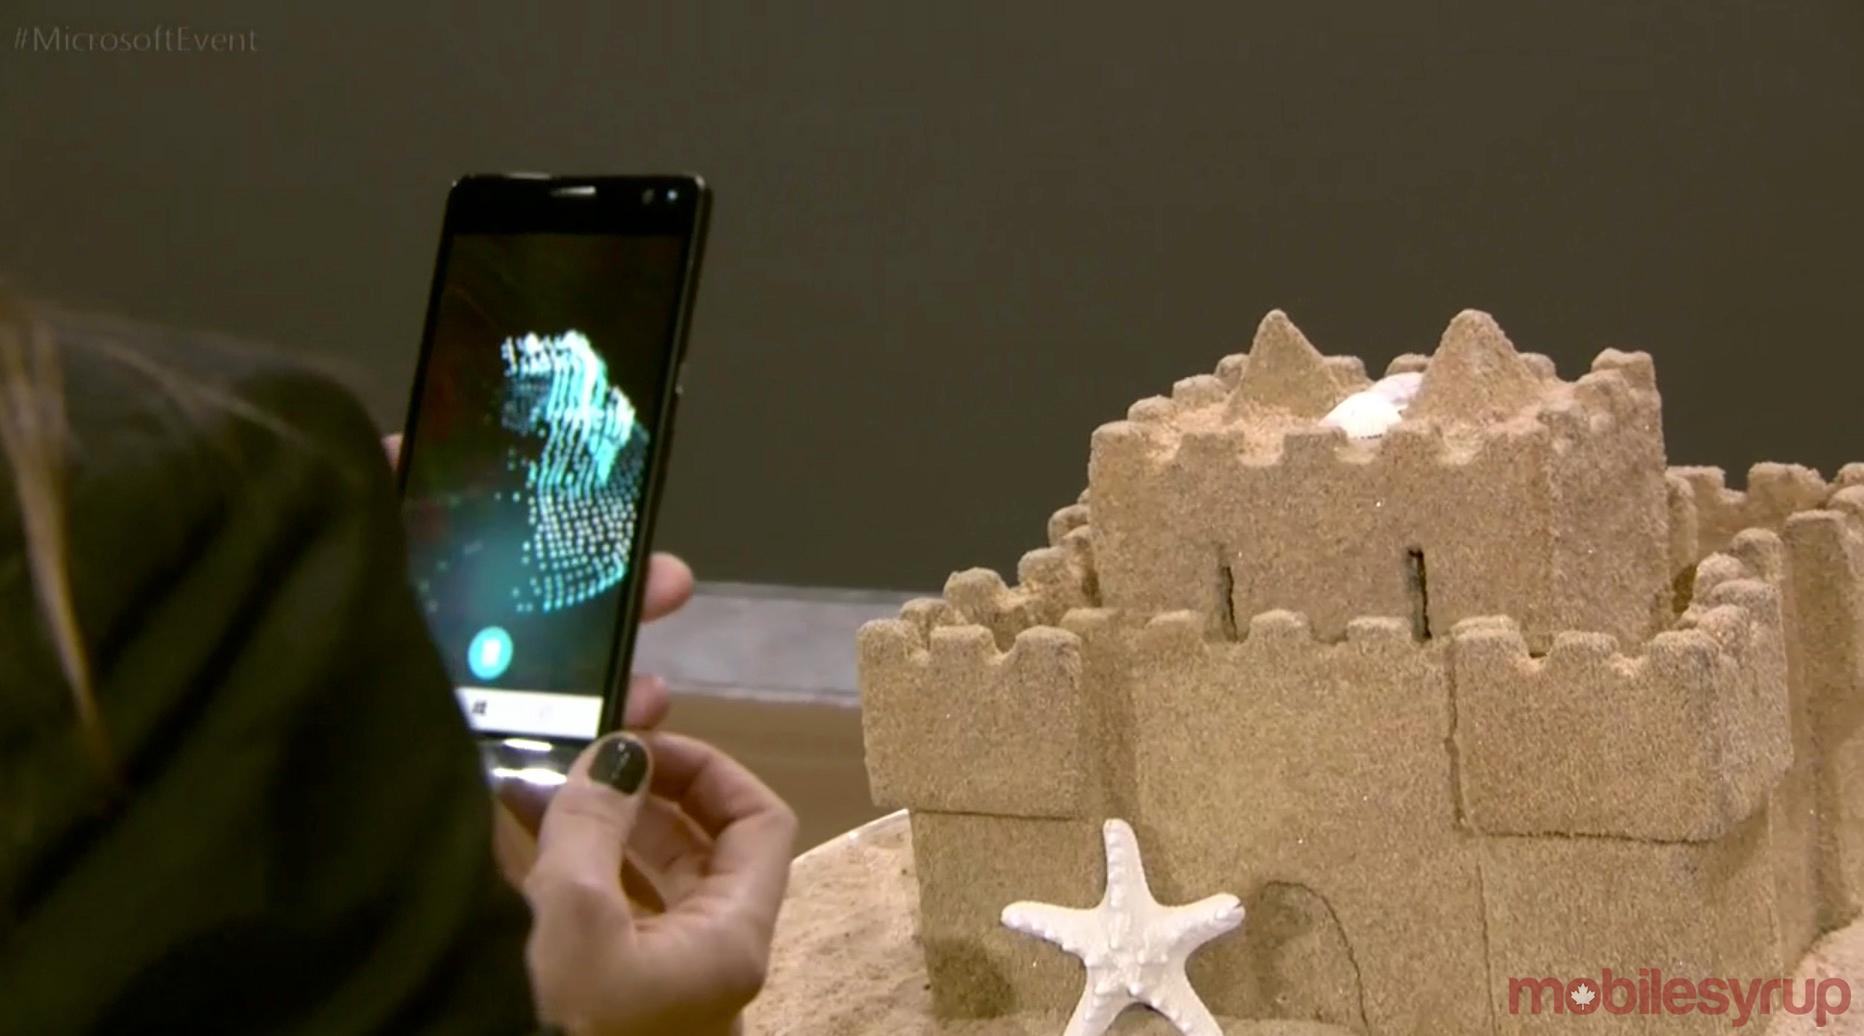 3D_scan_windows_phone